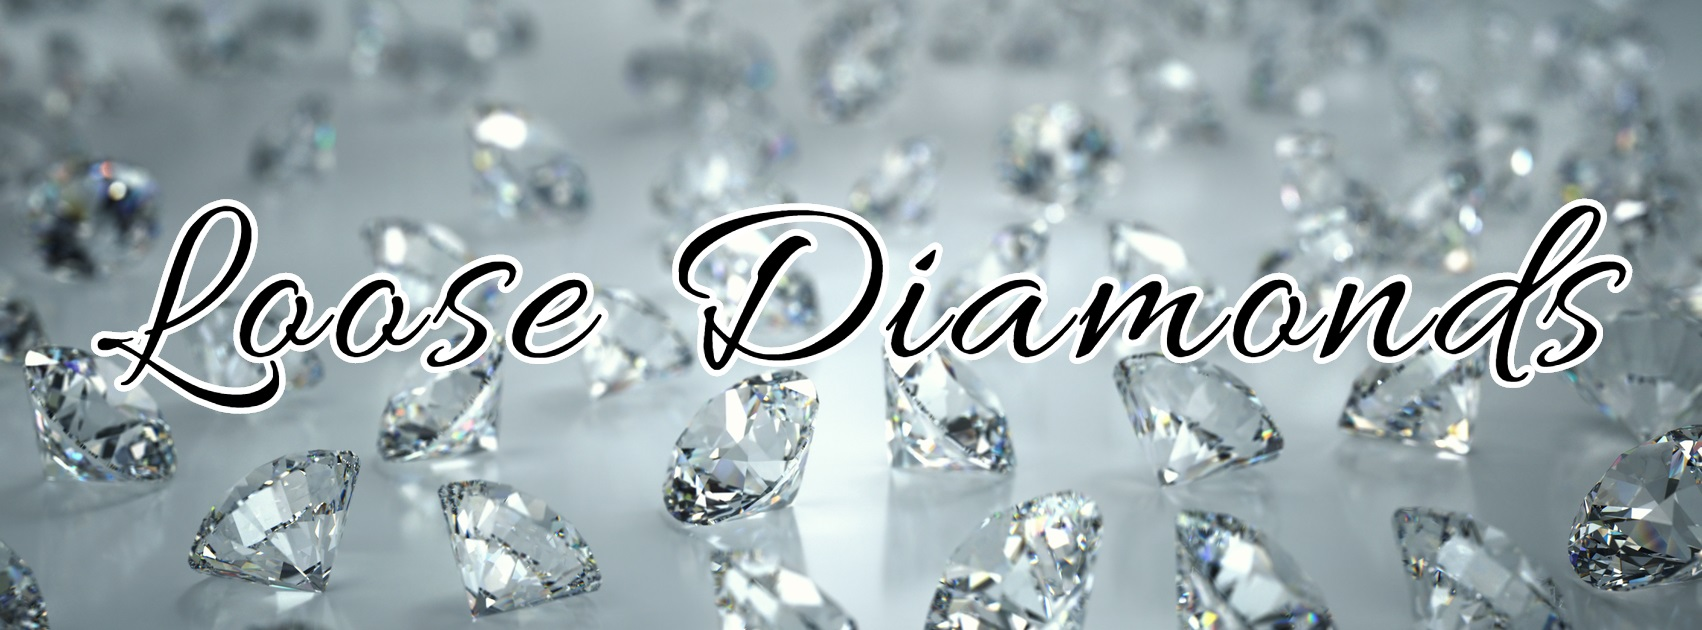 Antwerp Diamonds Jewelry and Fine Watches - Loose Diamonds